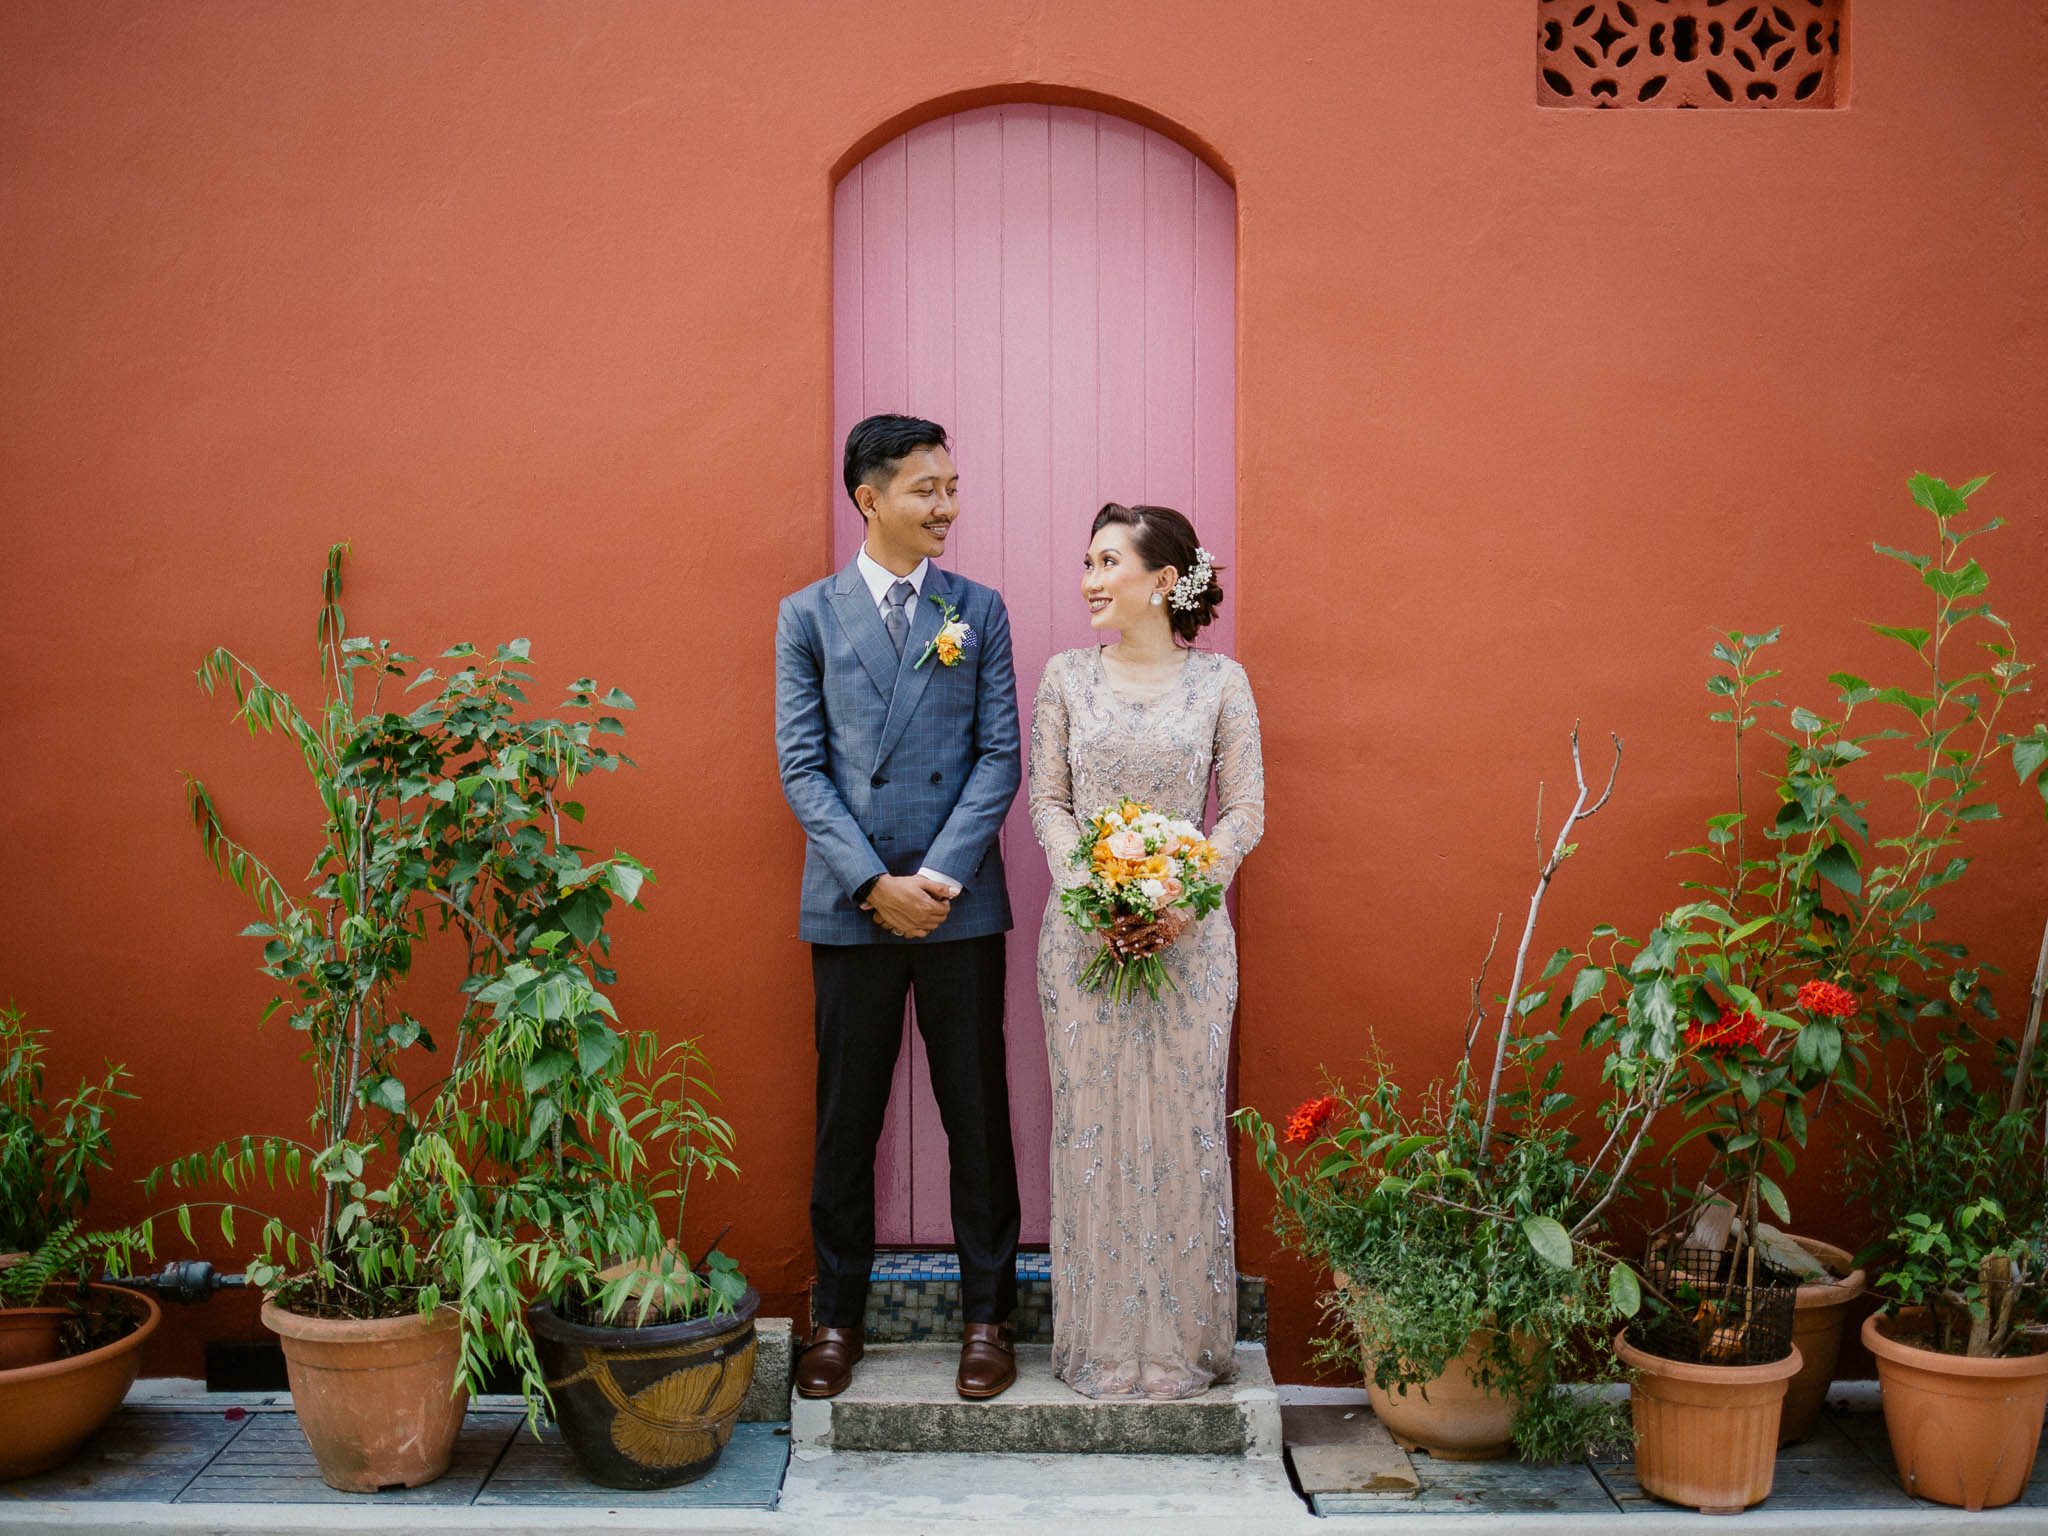 singapore-wedding-photographer-wedding-nufail-addafiq-083.jpg